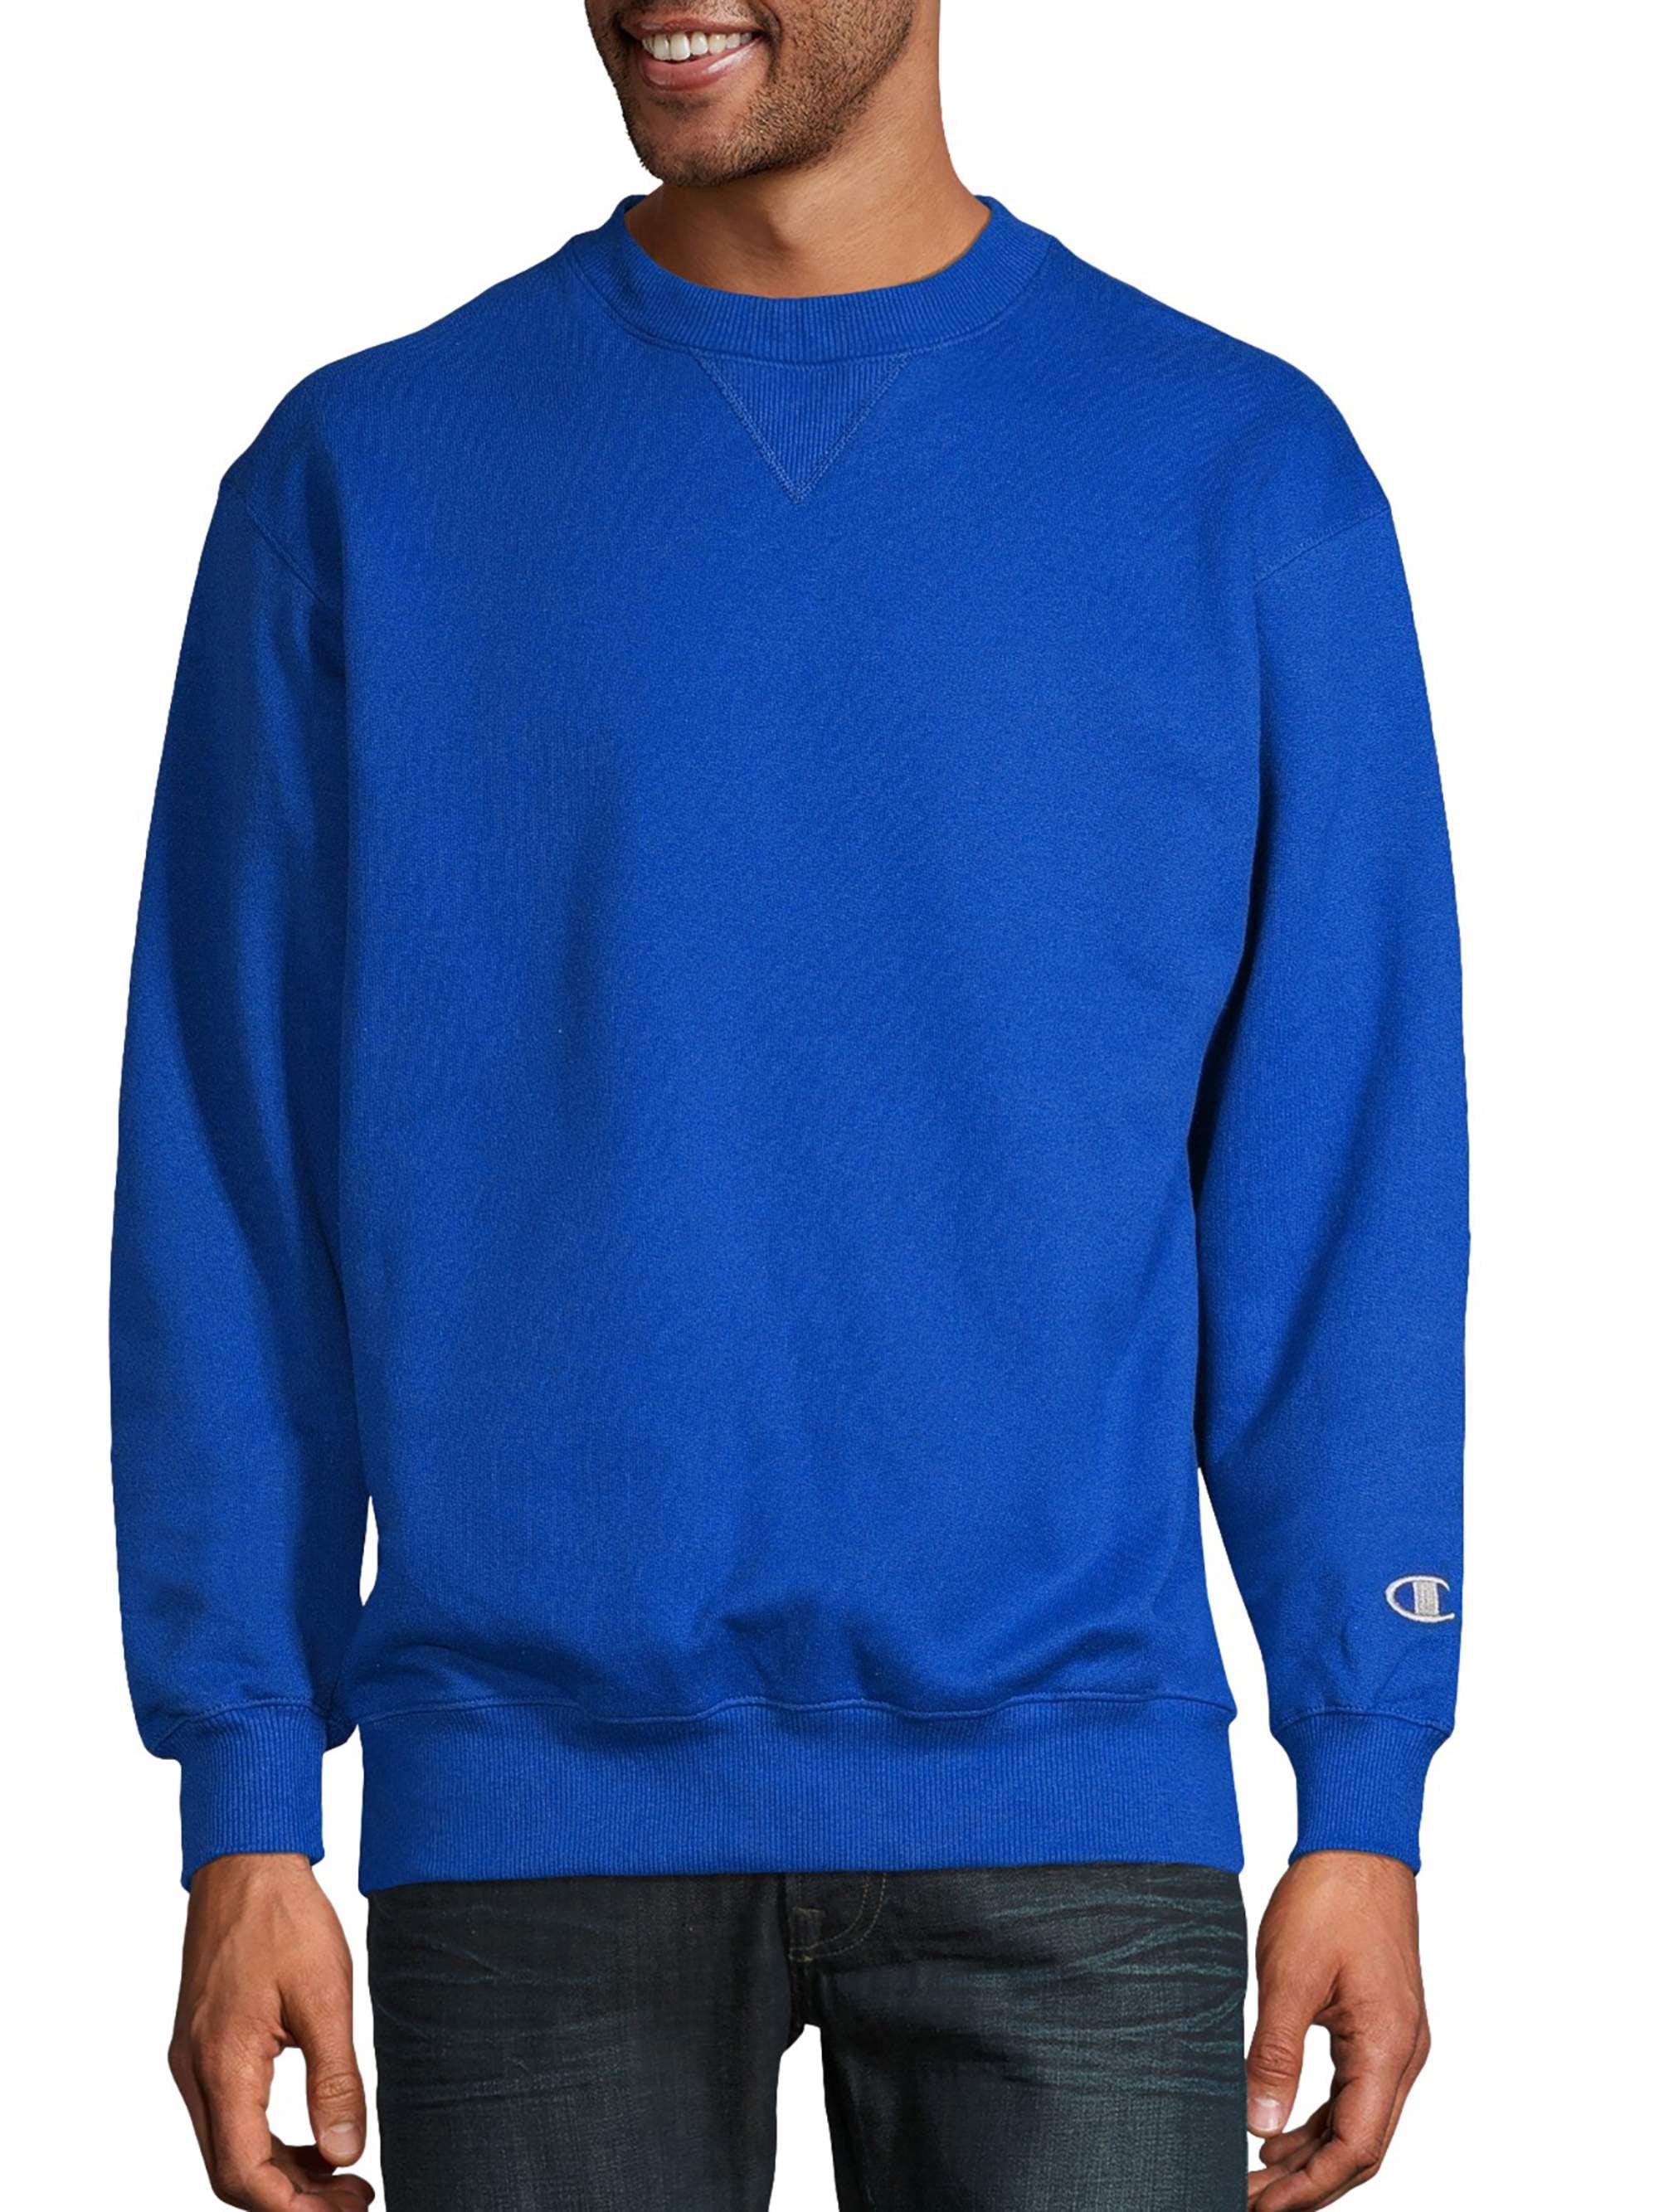 Mens Premium Crewneck Sweatshirts Cotton//Poly Fleece Sweatshirts Sizes XS-4XL